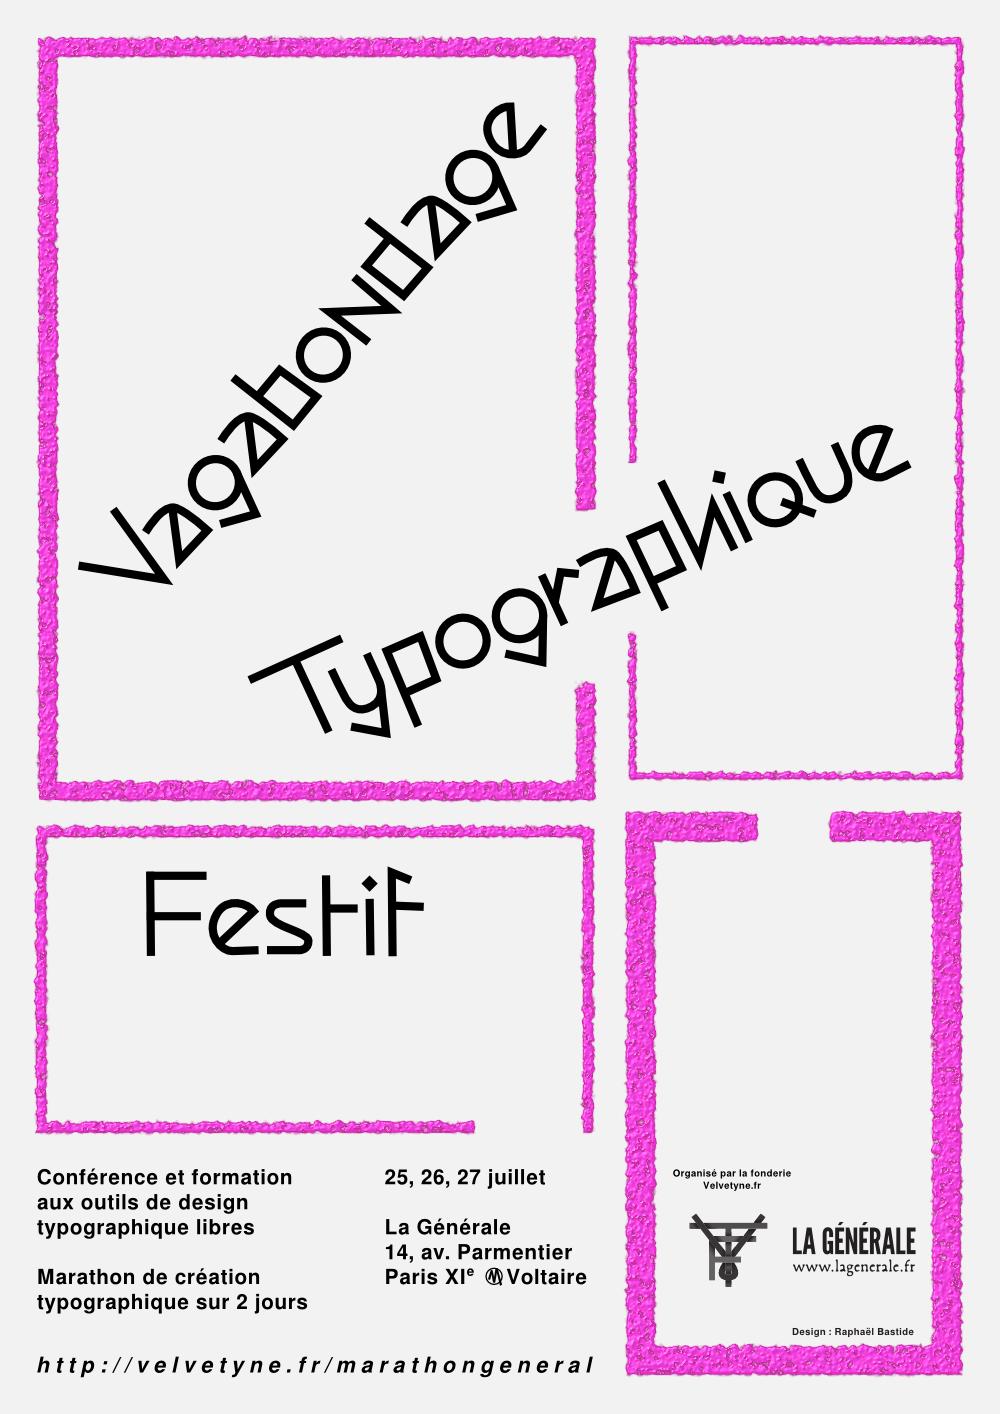 Marathons typographiques libres